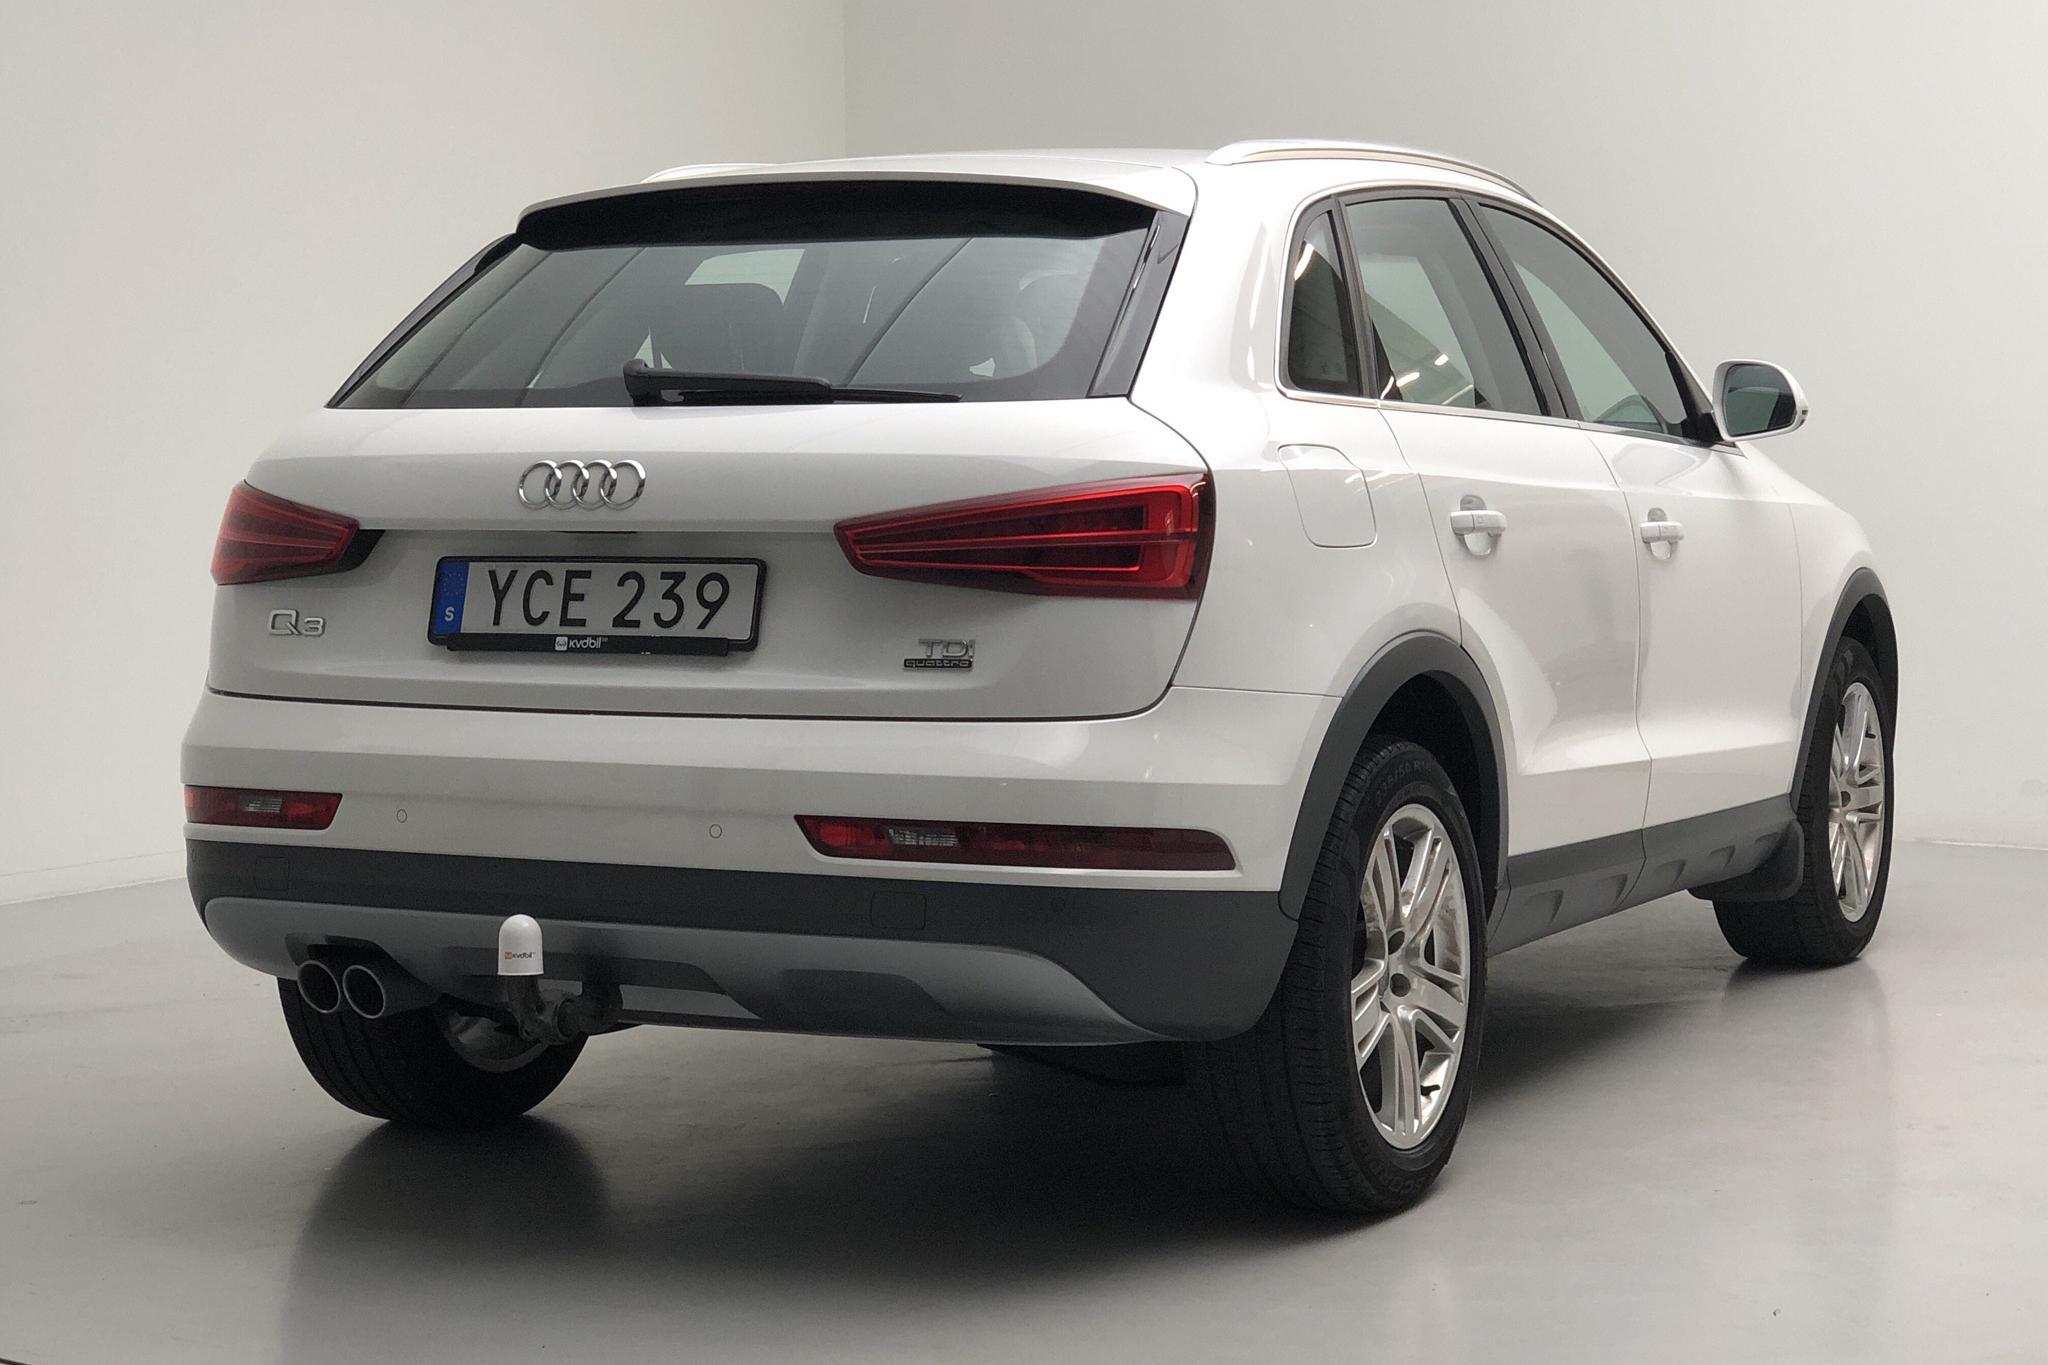 Audi Q3 2.0 TDI quattro (150hk) - 59 130 km - Automatic - white - 2016